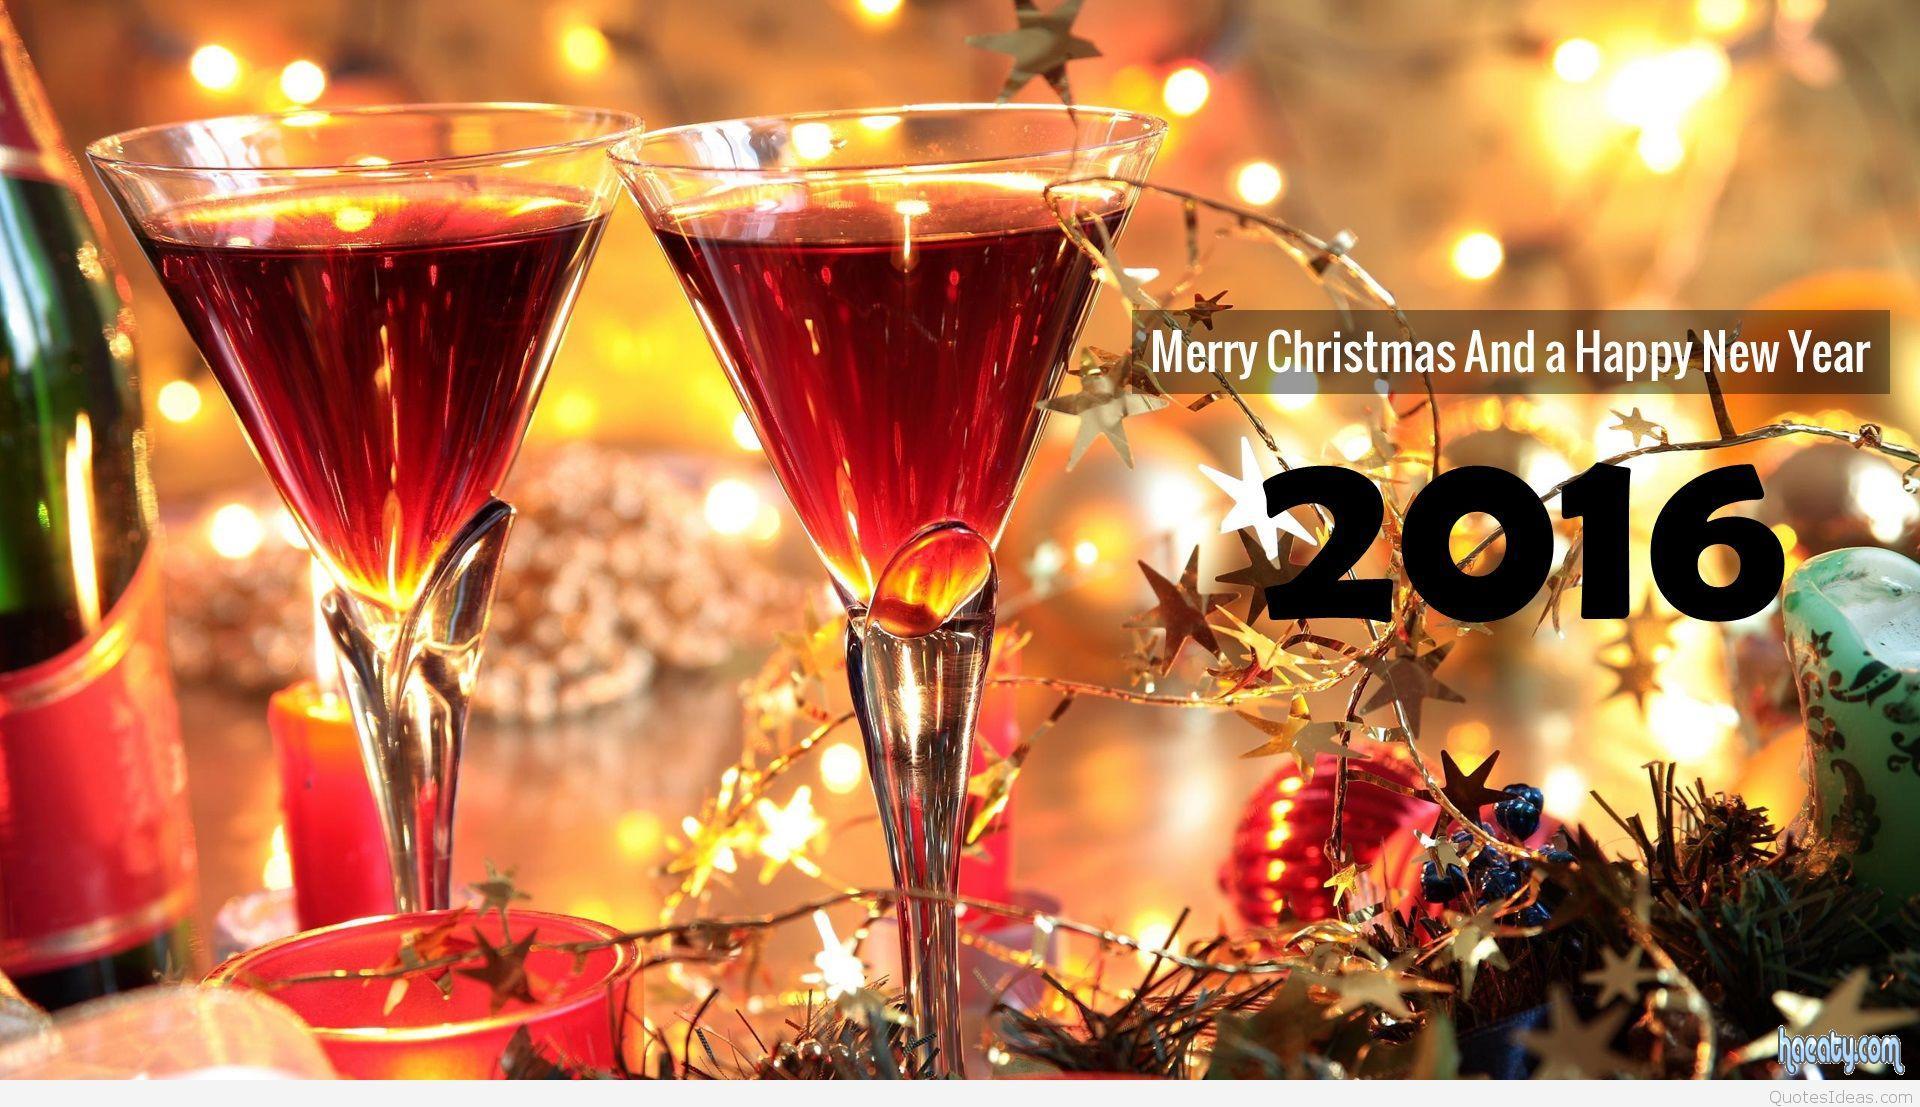 الكريسماس 2016-Merry-Christmas-and-Happy-new-year-2016 1450541032041.jpg